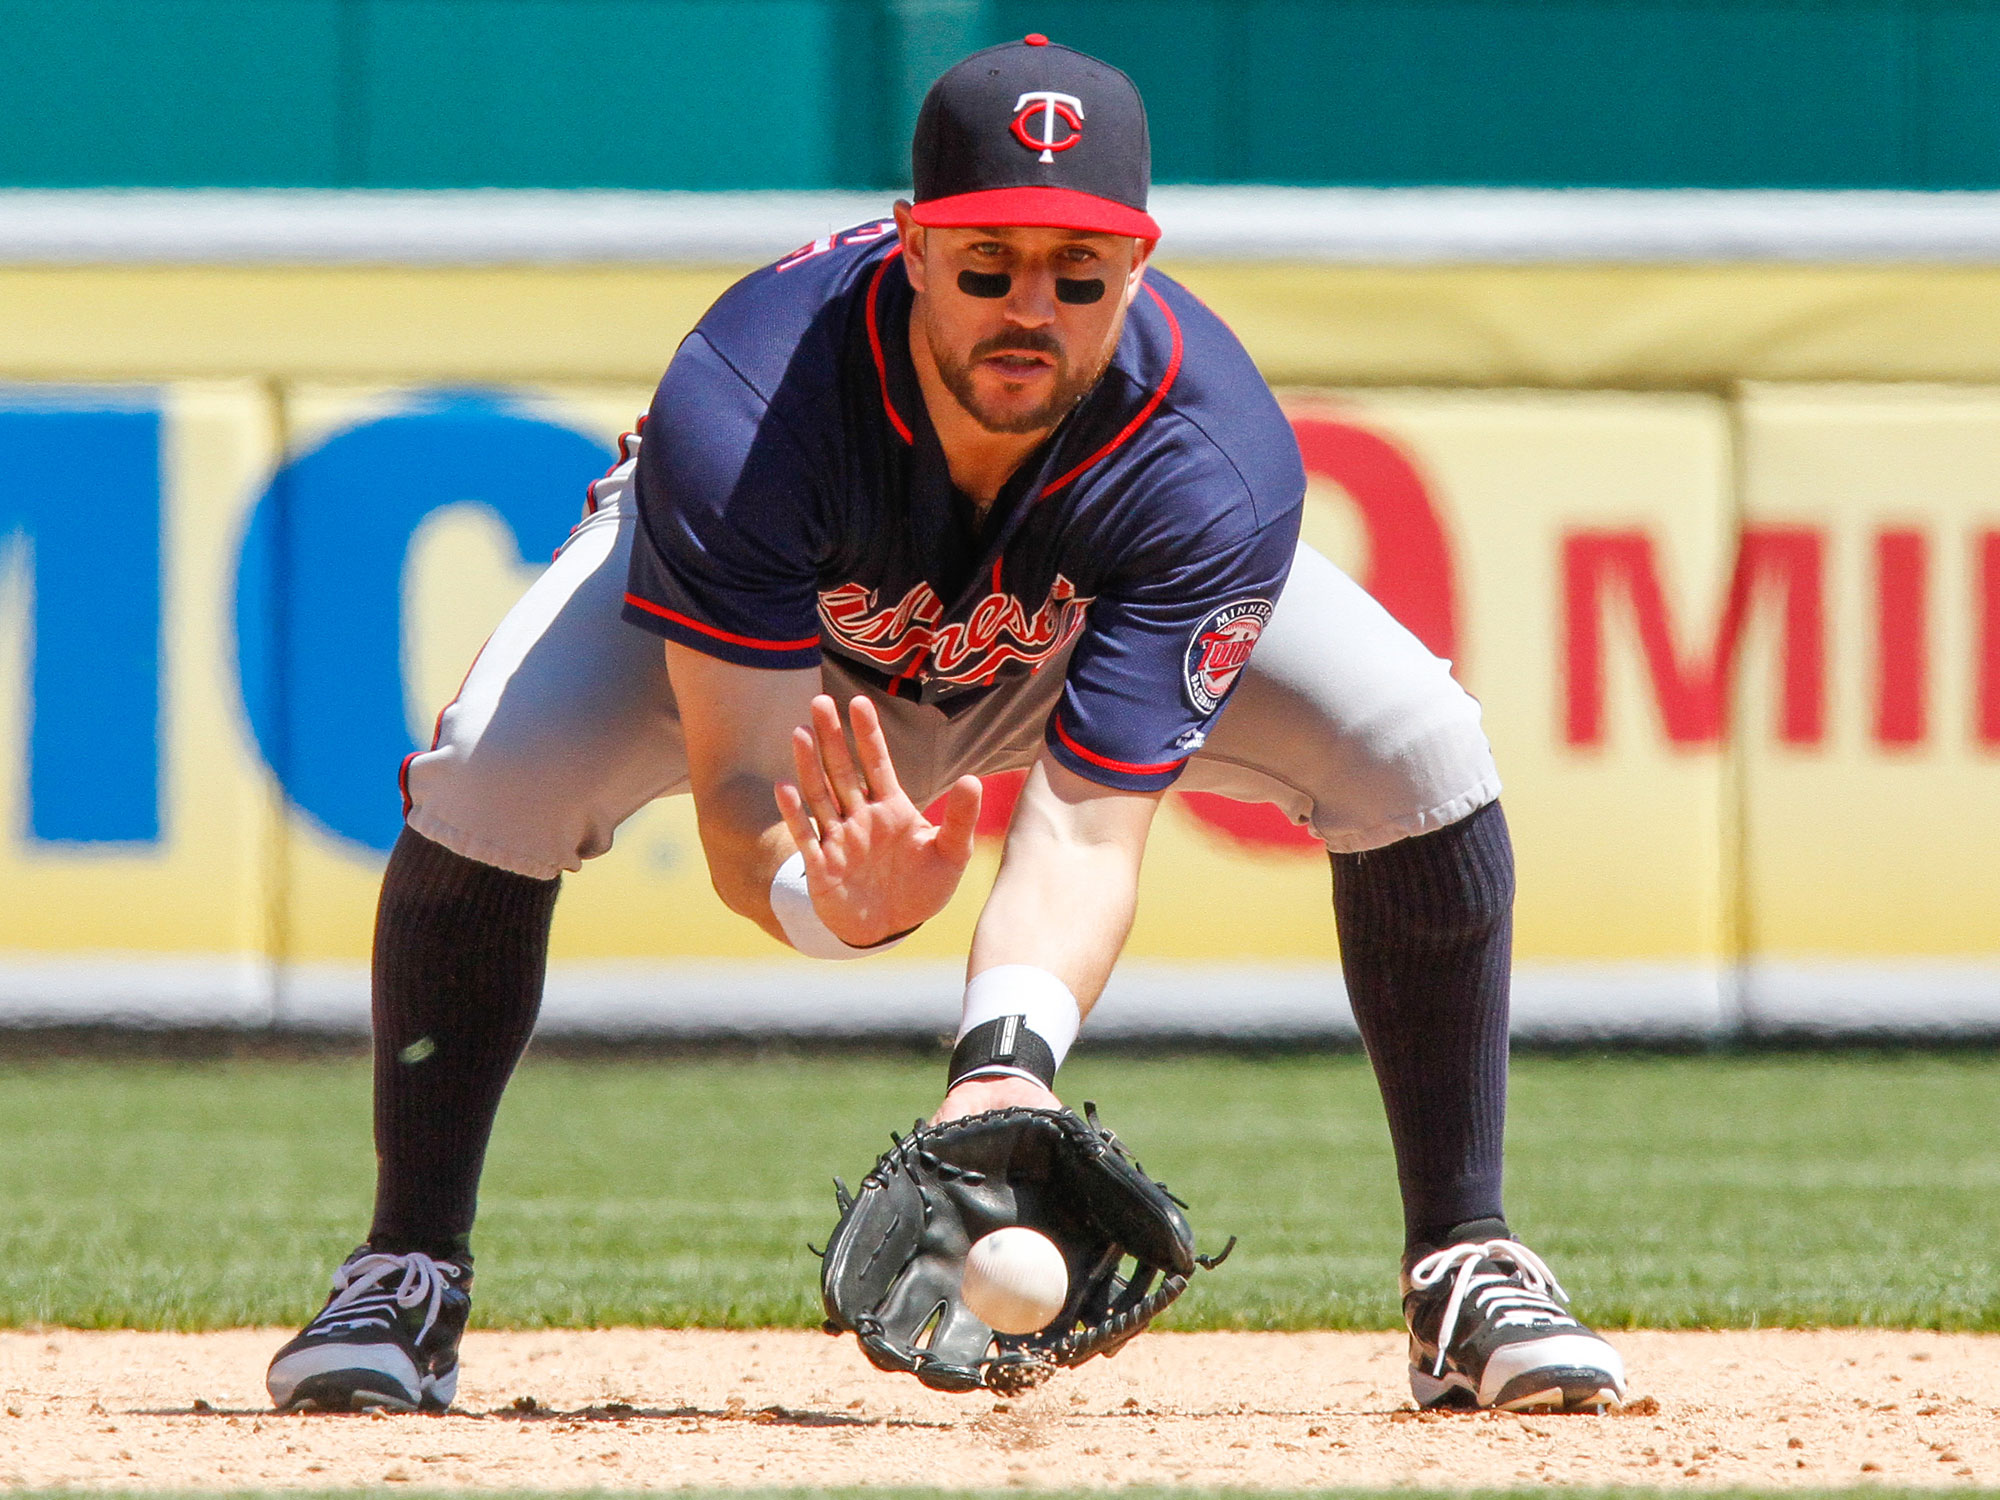 Trevor Plouffe, Minnesota Twins